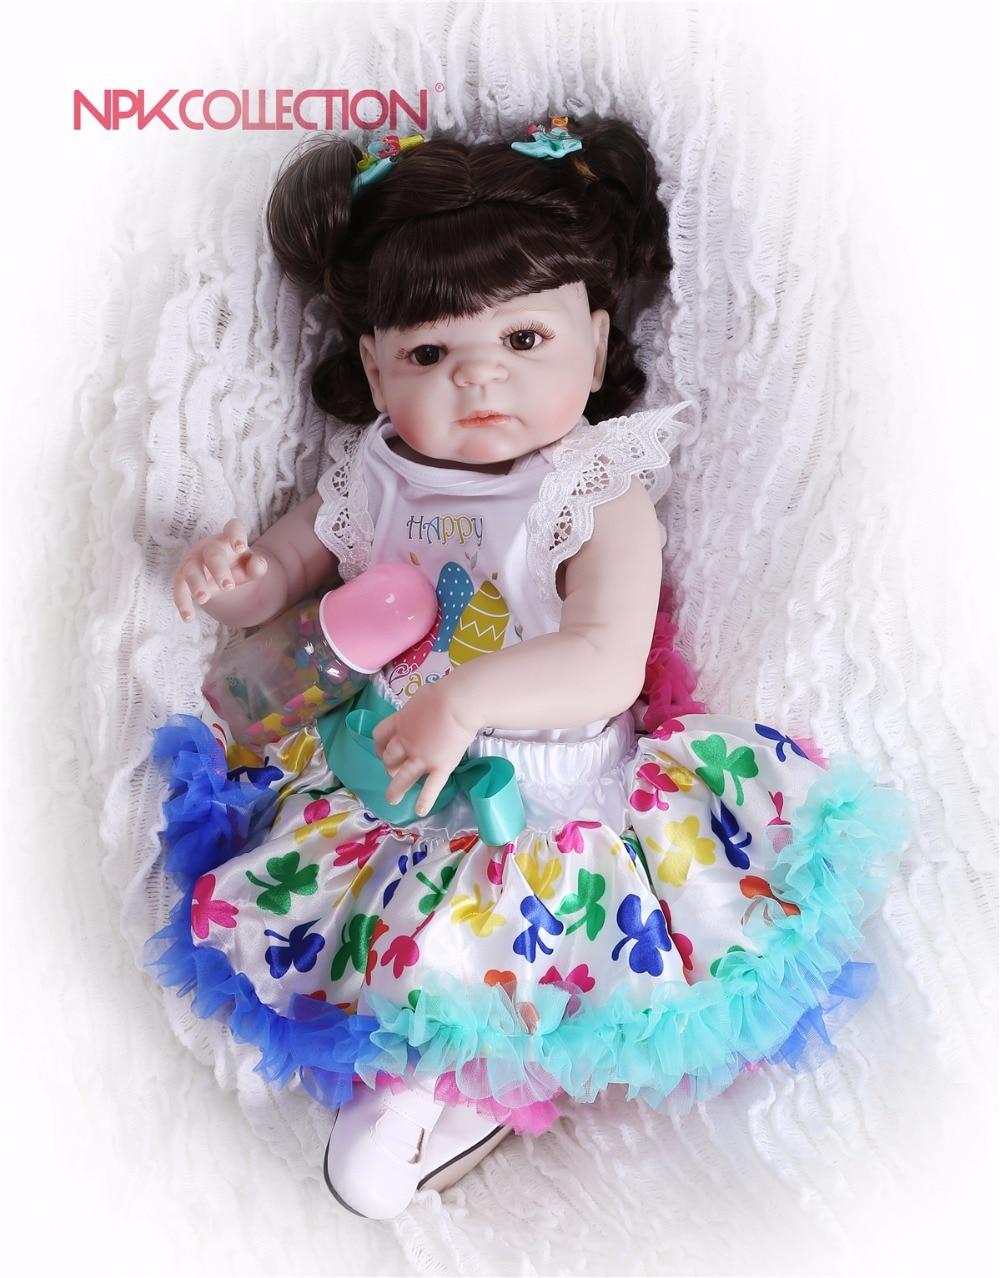 NPKCOLLECTION New Hairstyle Girl Doll Full Silicone Body Lifelike Bebes Reborn Princess Girl Doll Handmade Baby